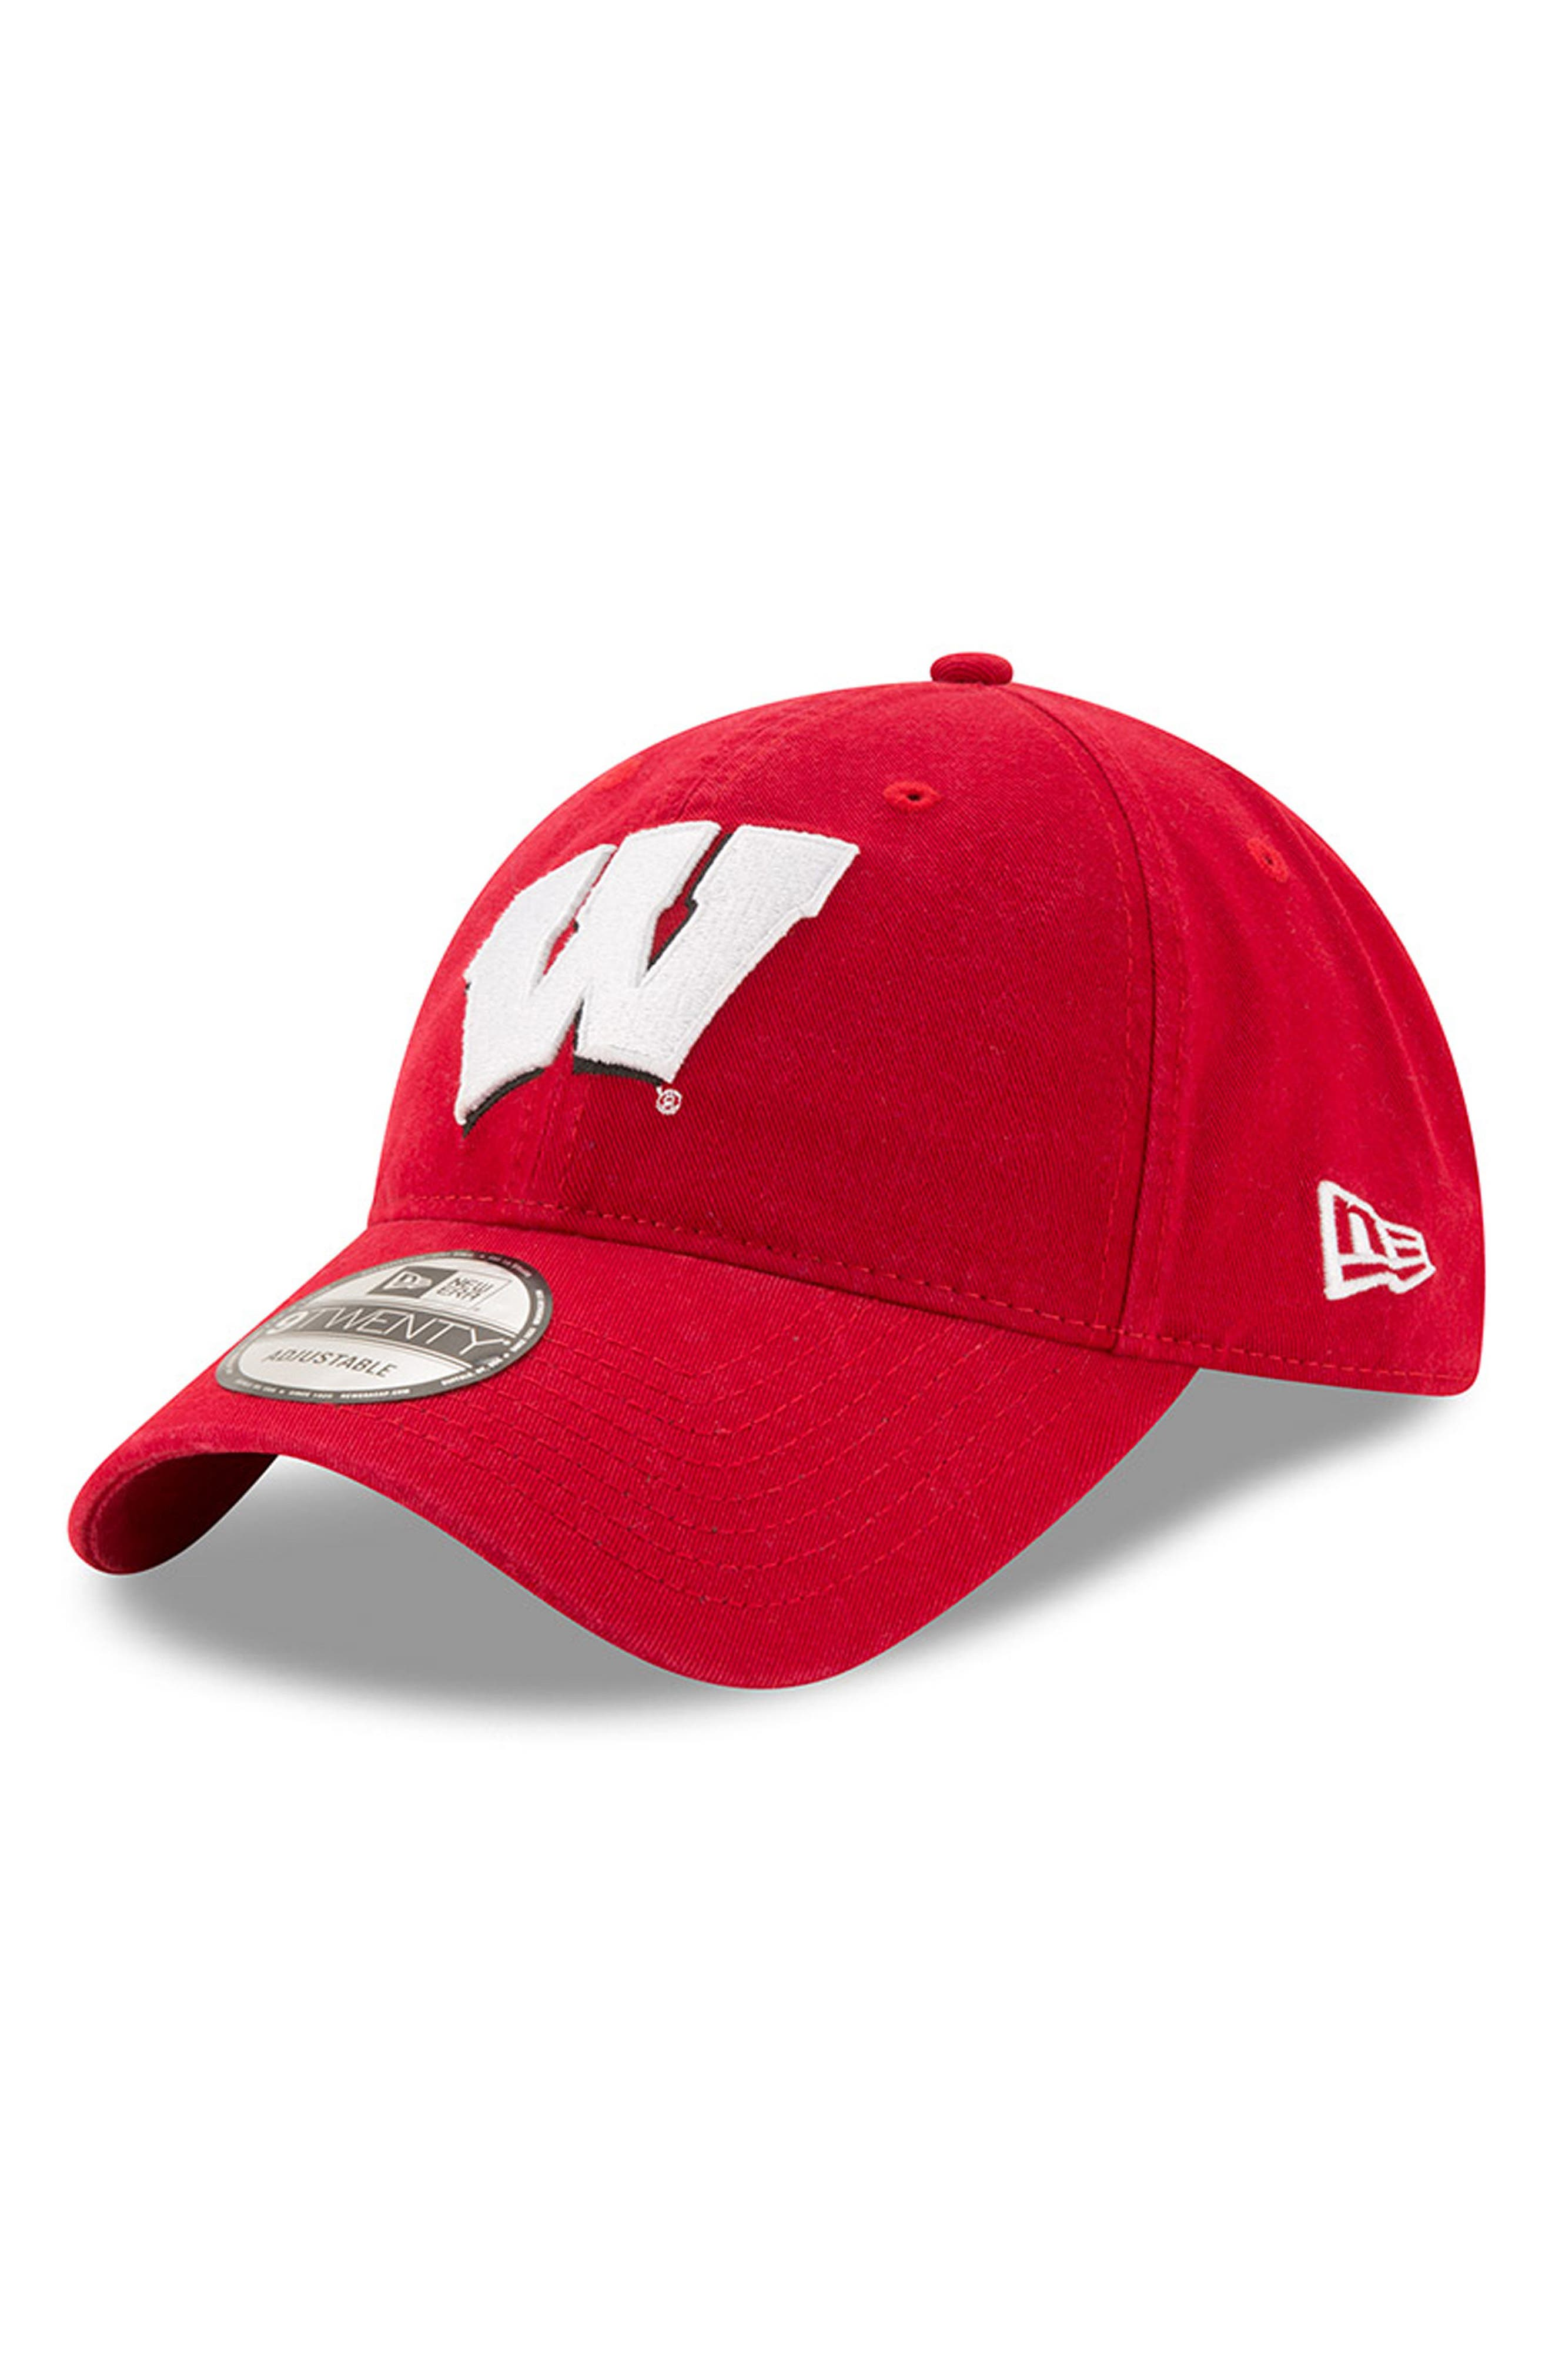 New Era Collegiate Core Classic - Wisconsin Badgers Baseball Cap,                             Main thumbnail 1, color,                             Wisconsin Badgers